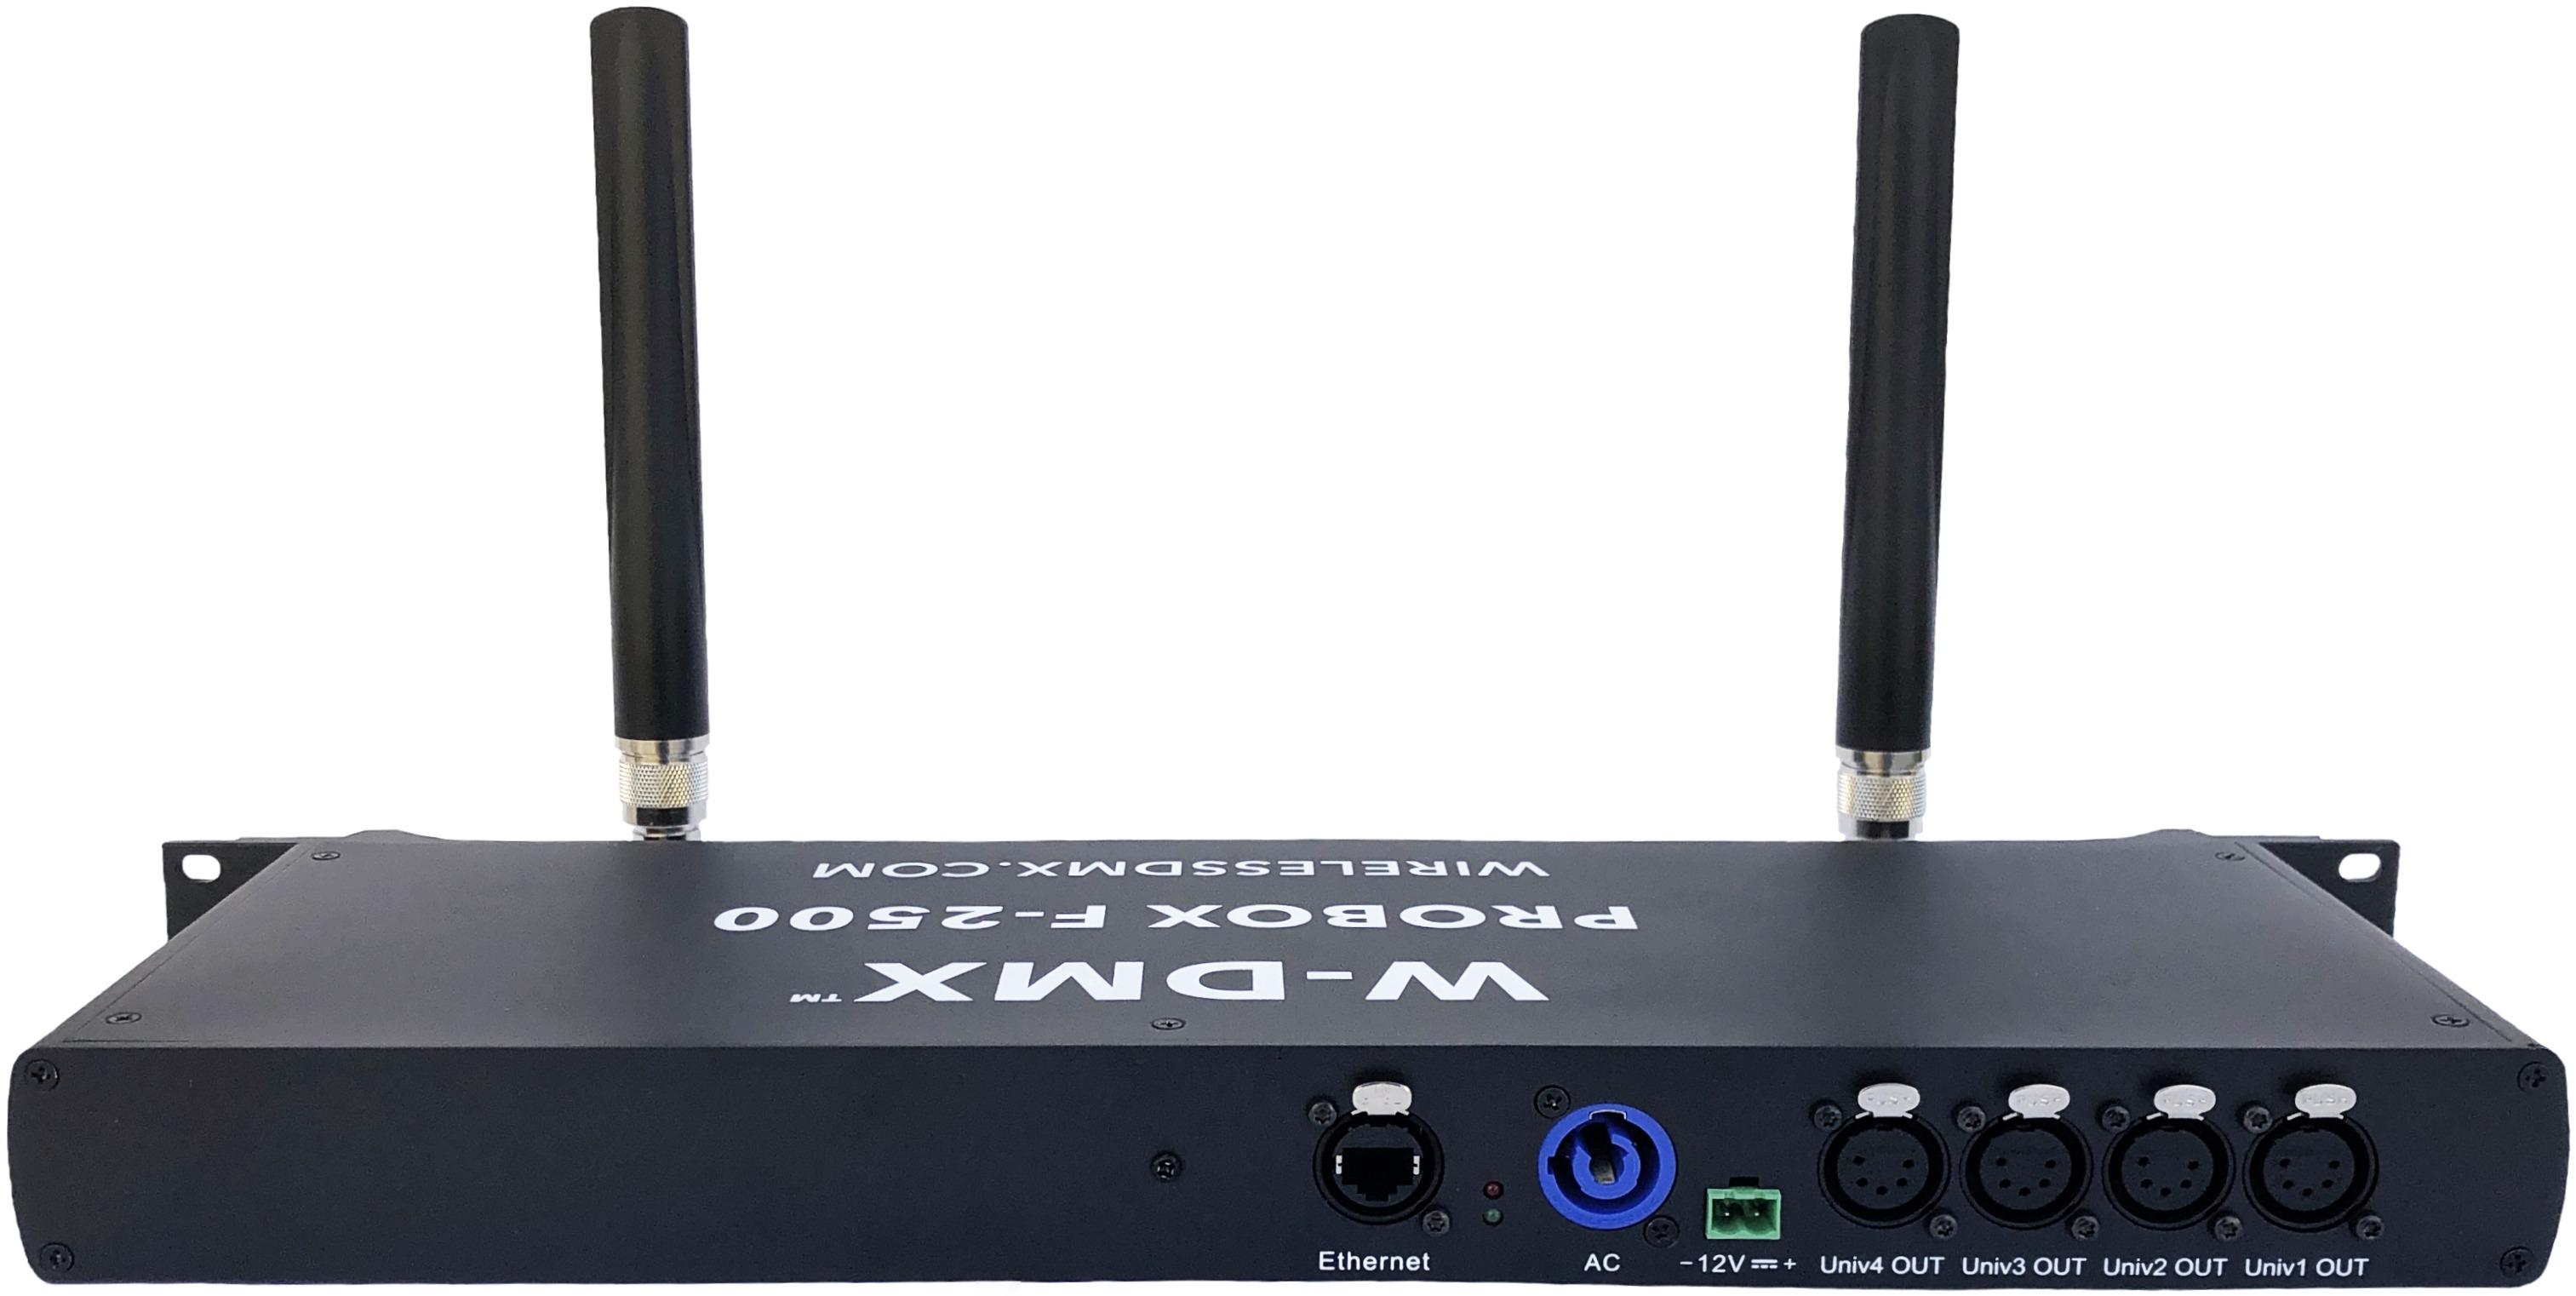 ProBox F-2500 G5